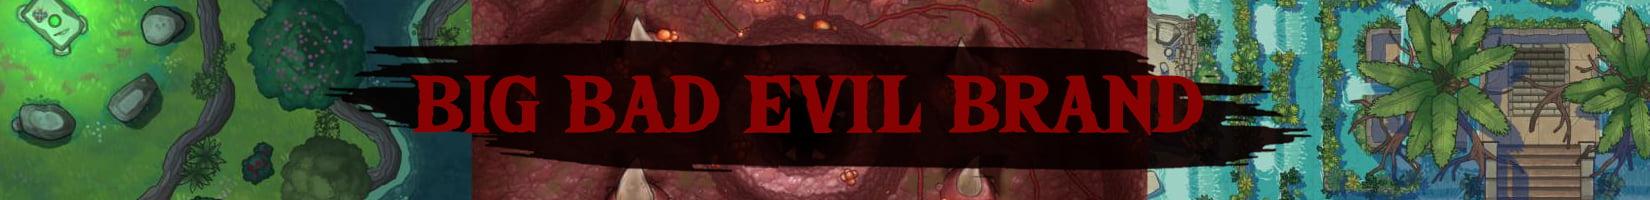 Big Bad Evil Brand